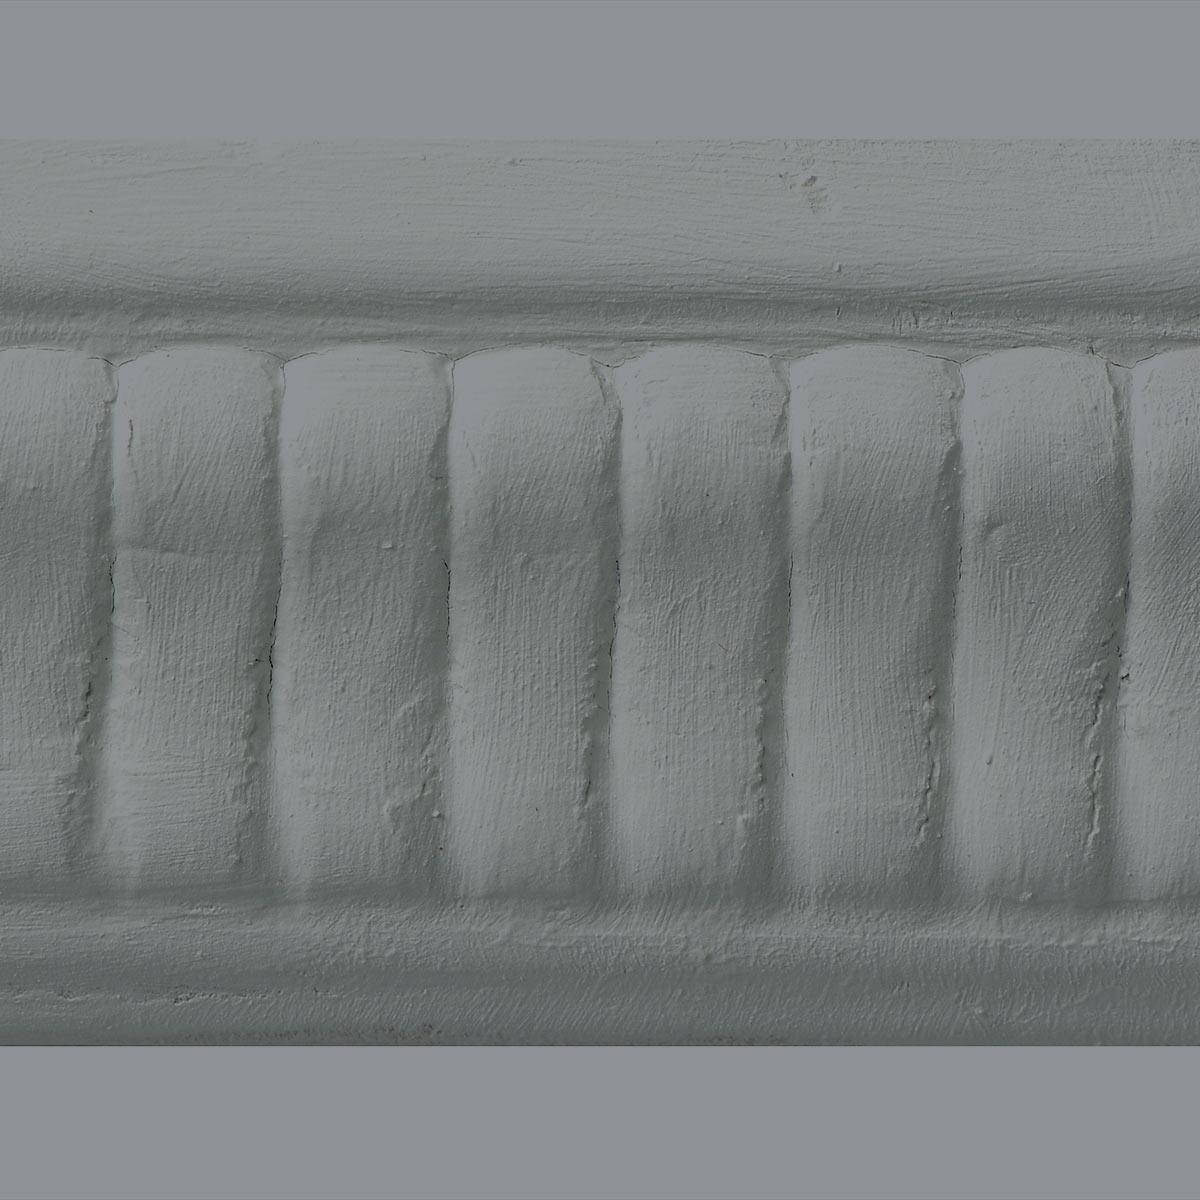 Waverly ® Inspirations Chalk Finish Acrylic Paint - Steel, 8 oz. - 44862E